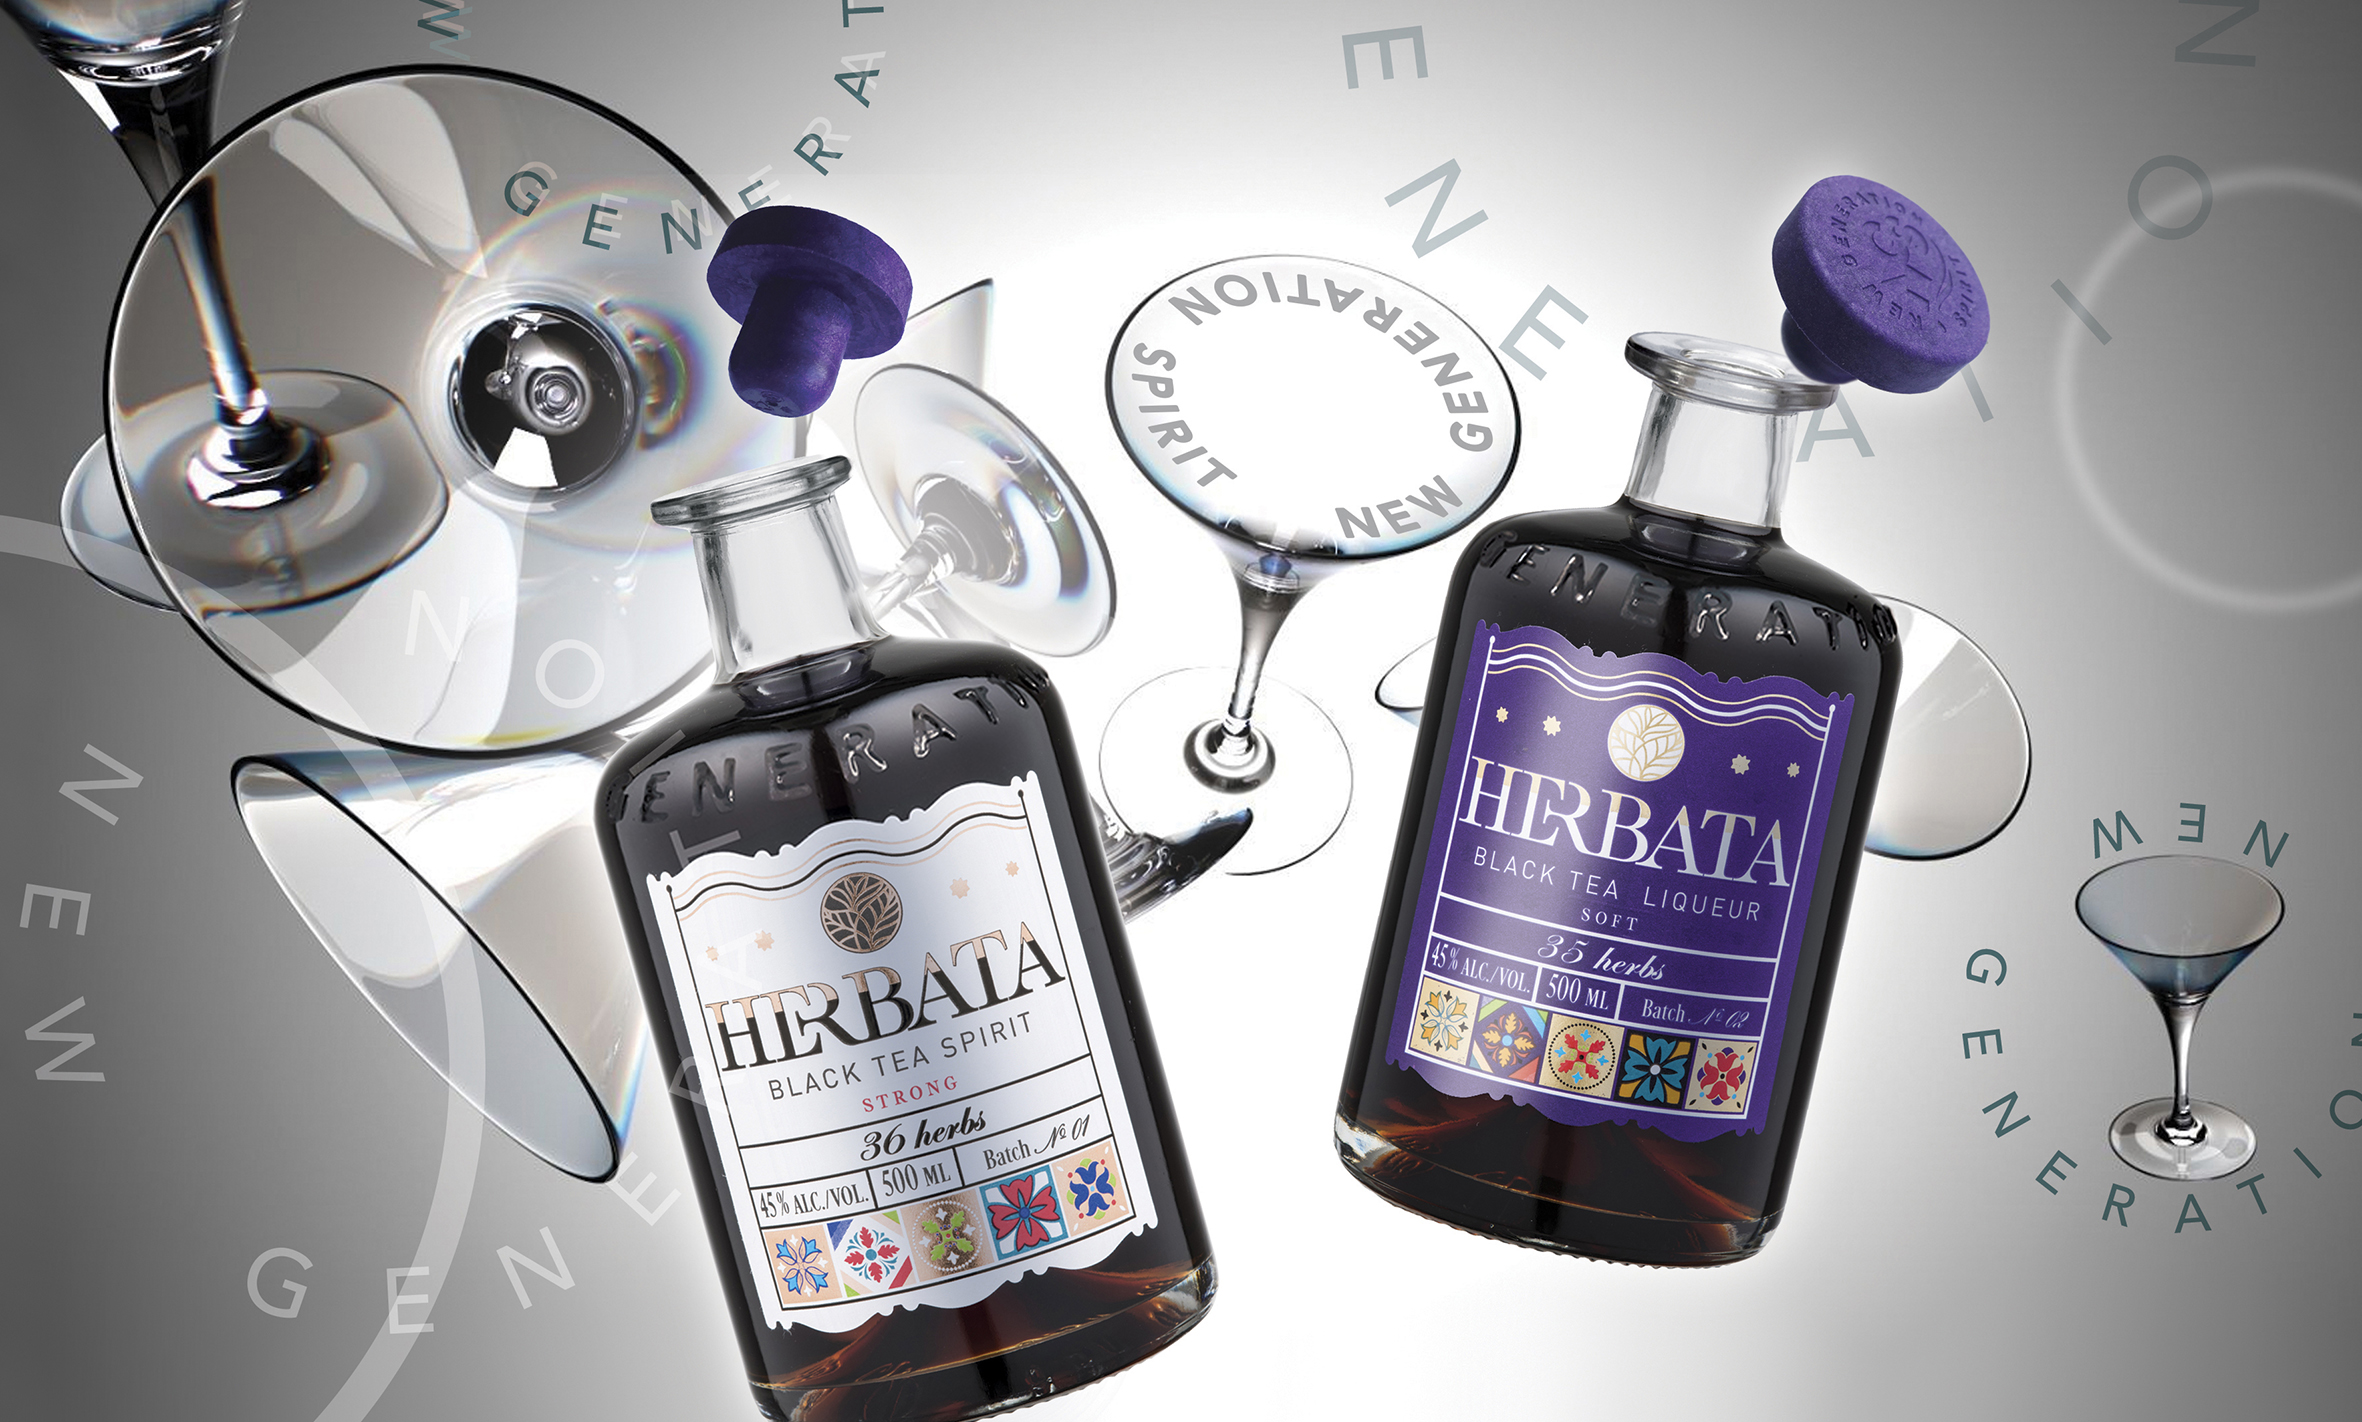 Zhuk Igor Creates Branding and Packaging for Herbata Black Tea Spirit